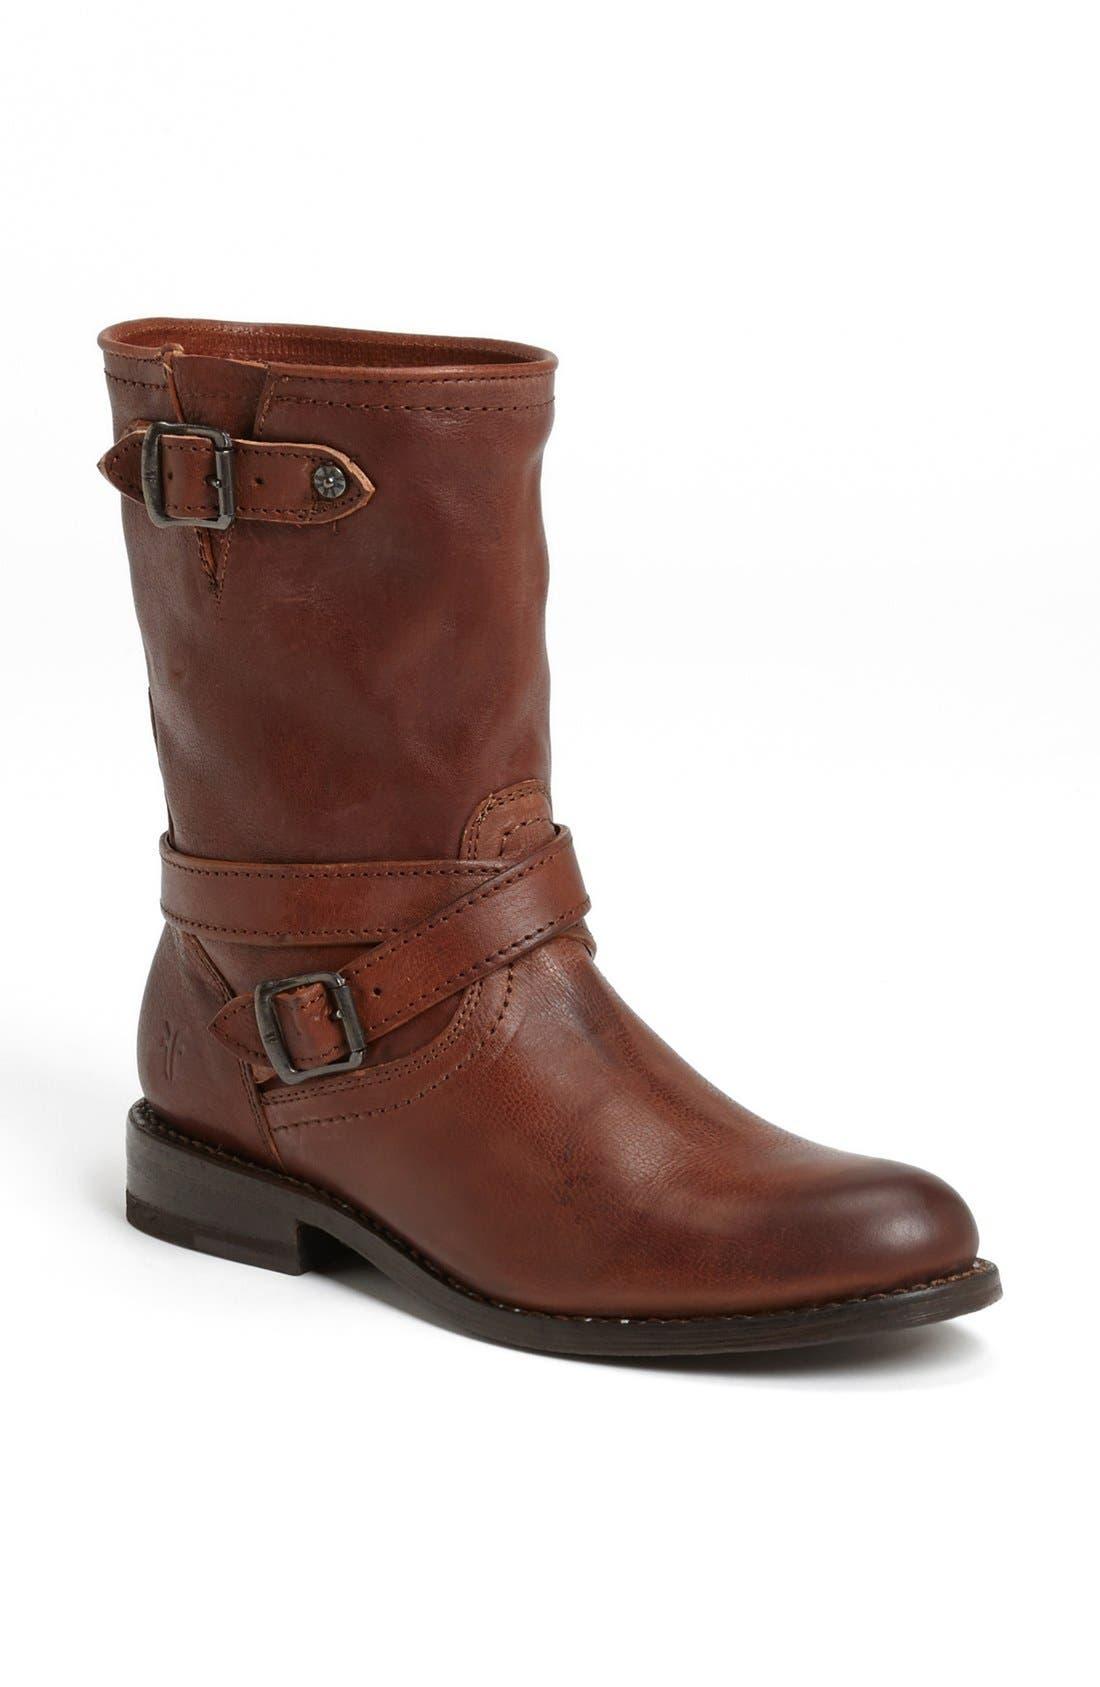 Main Image - Frye 'Jayden Cross Engineer' Leather Boot